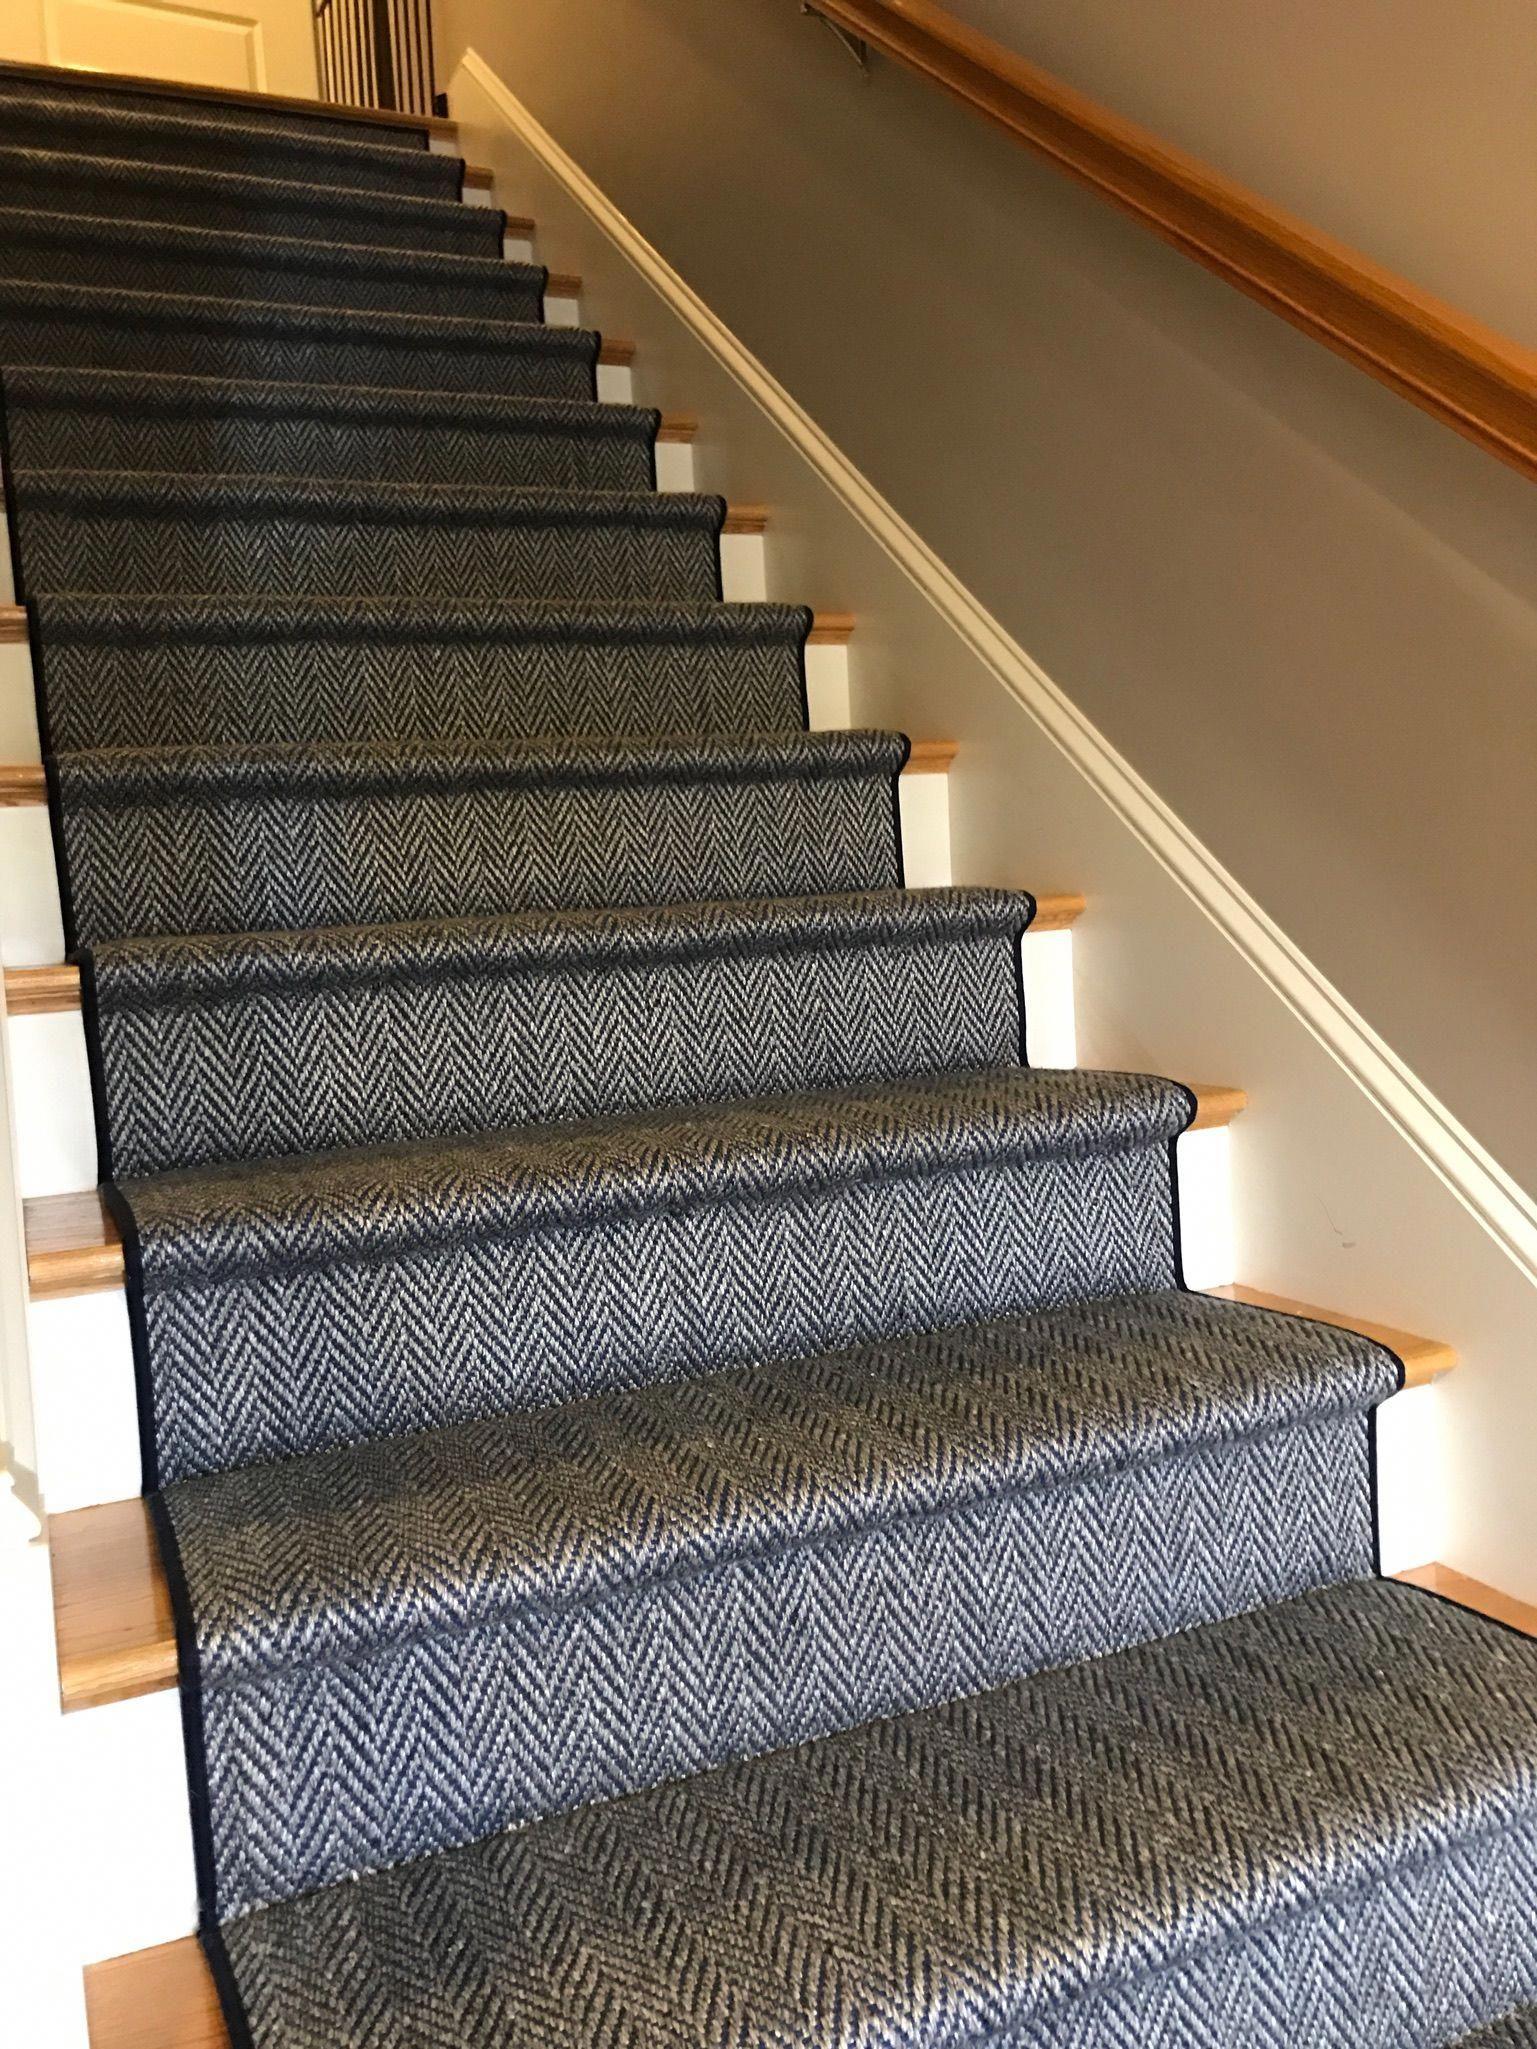 Best Carpet Stair Runners For Sale Code 6256306878 Carpet 400 x 300